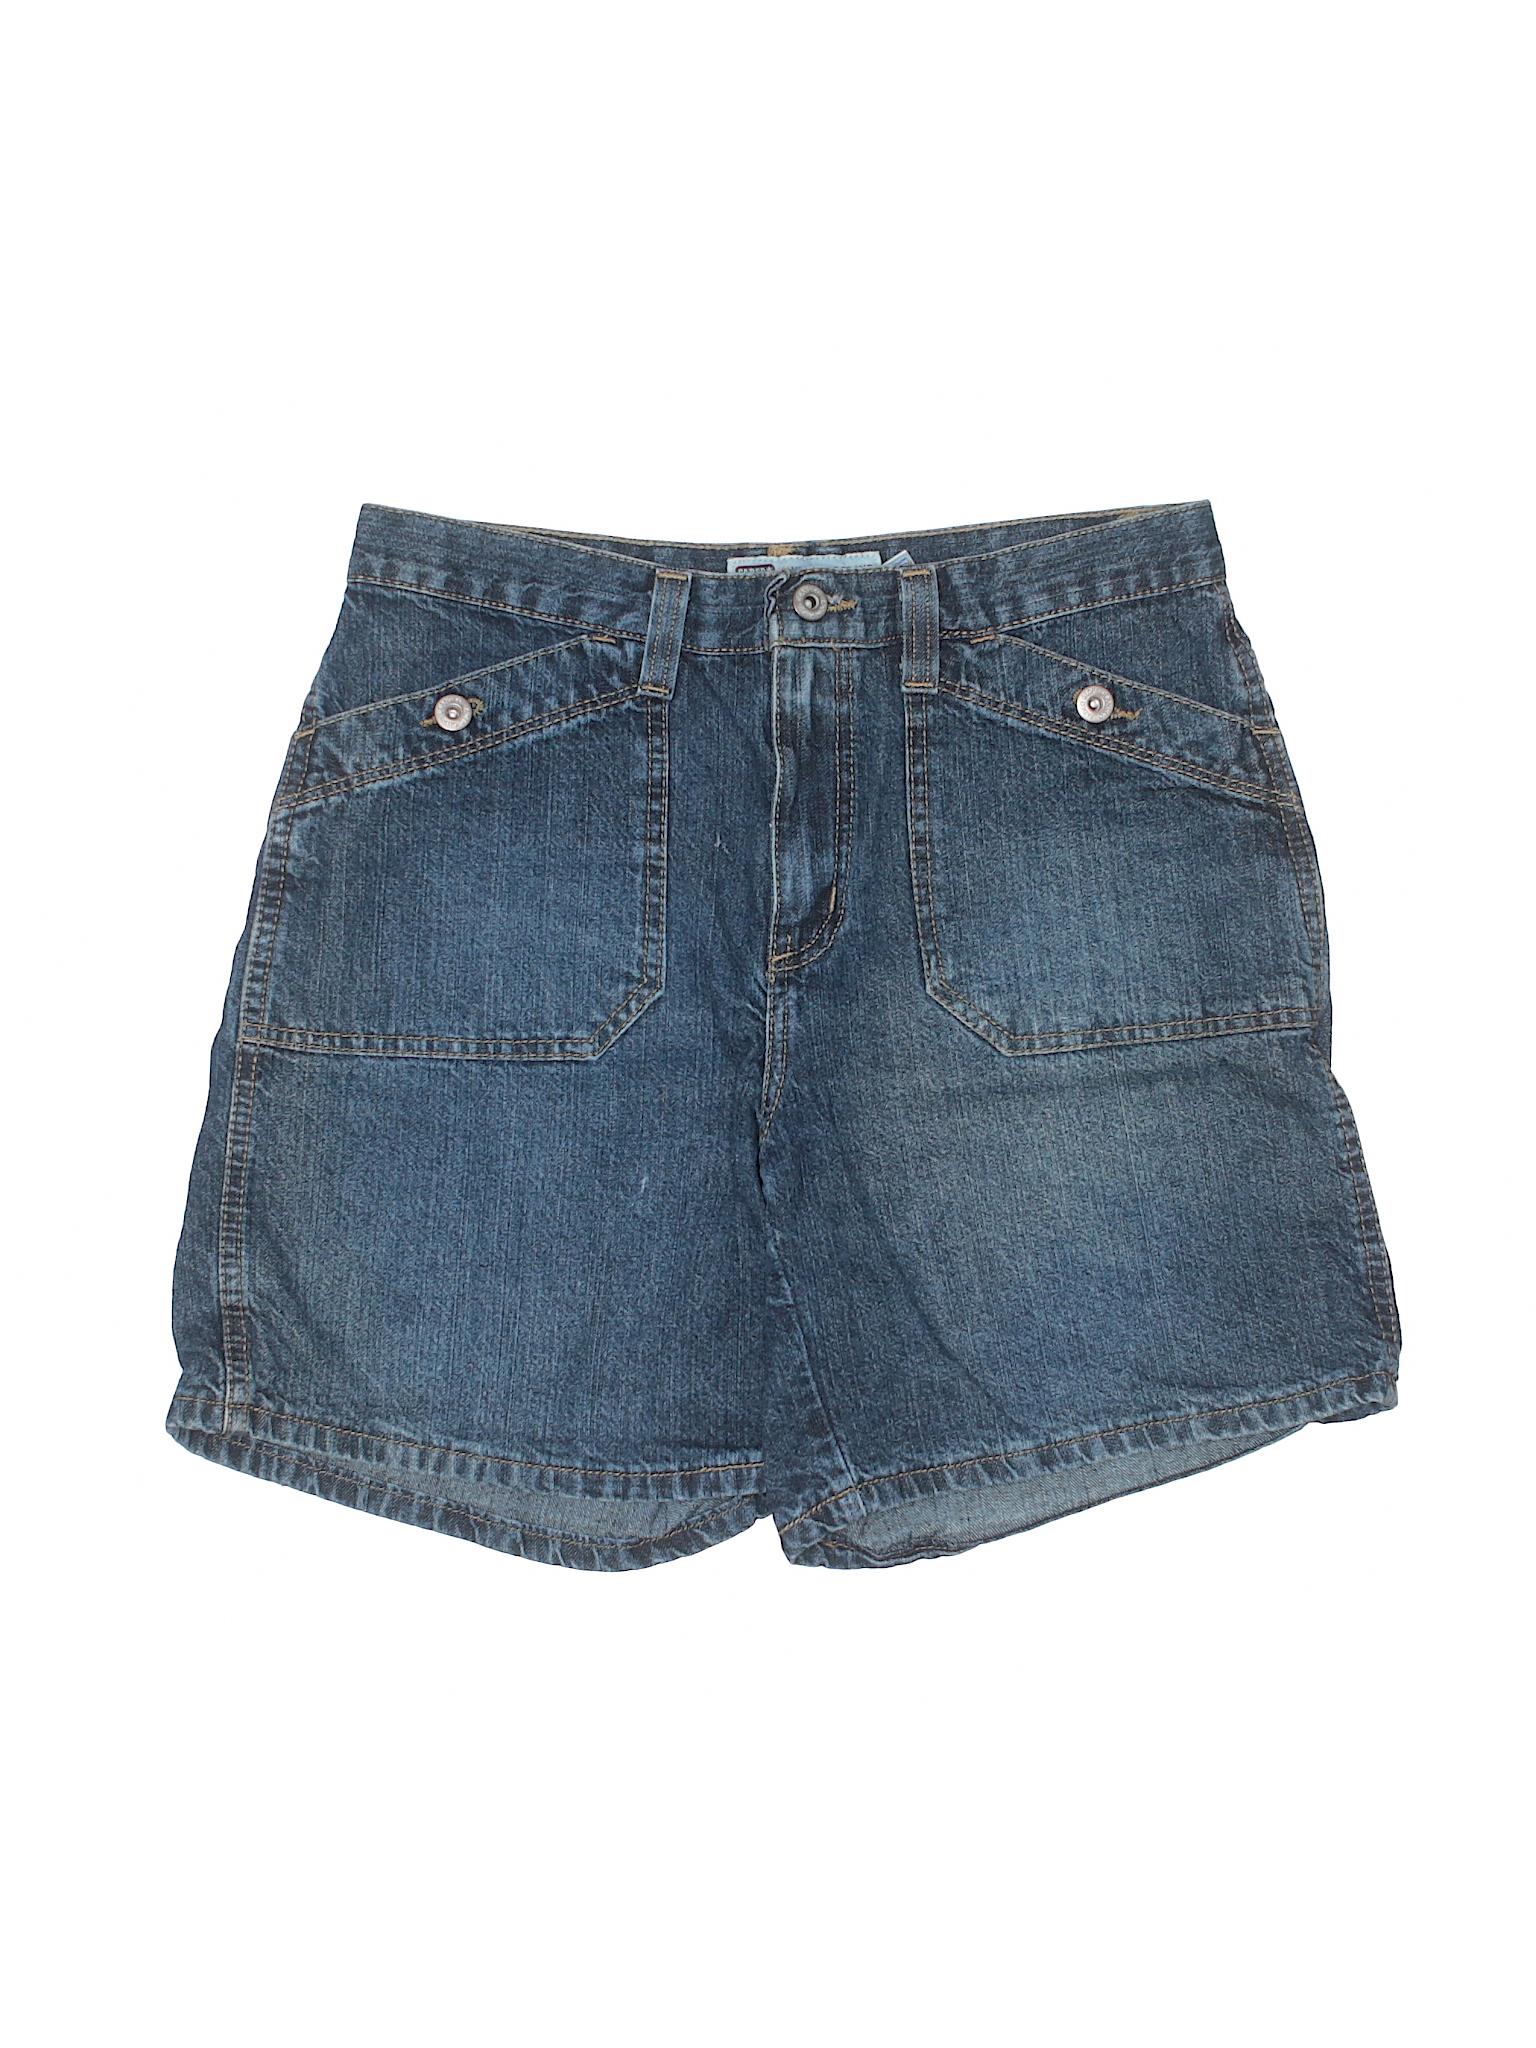 Denim Shorts Glory Denim Boutique Glory Faded Faded Boutique Shorts Boutique Faded CRFwxvq5R